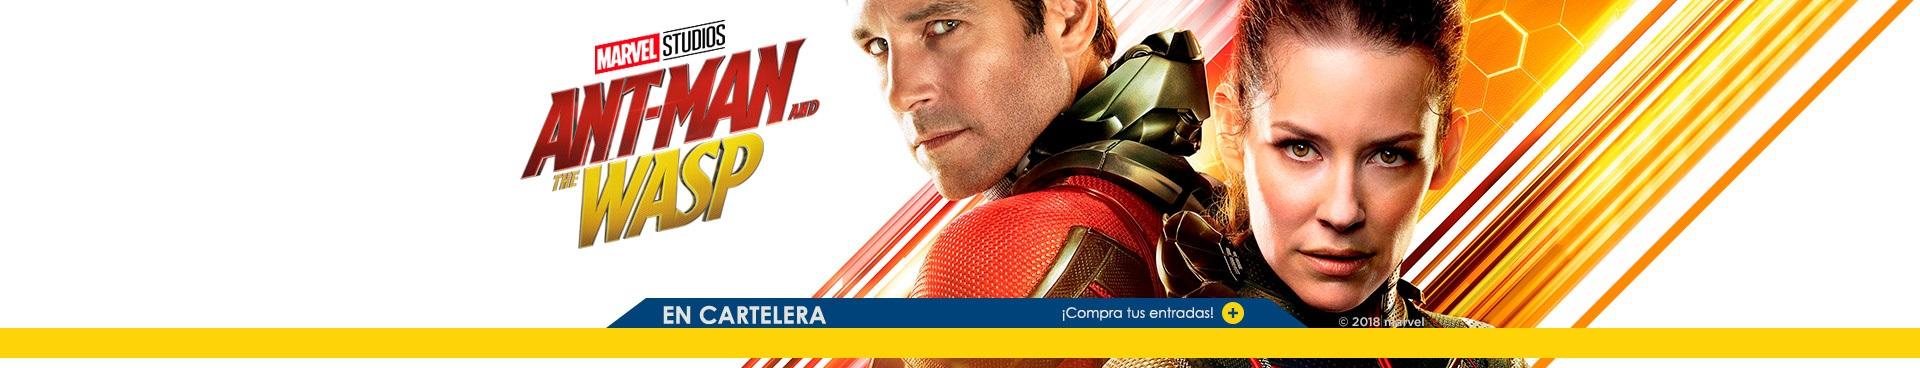 Estreno Ant-man & the wasp